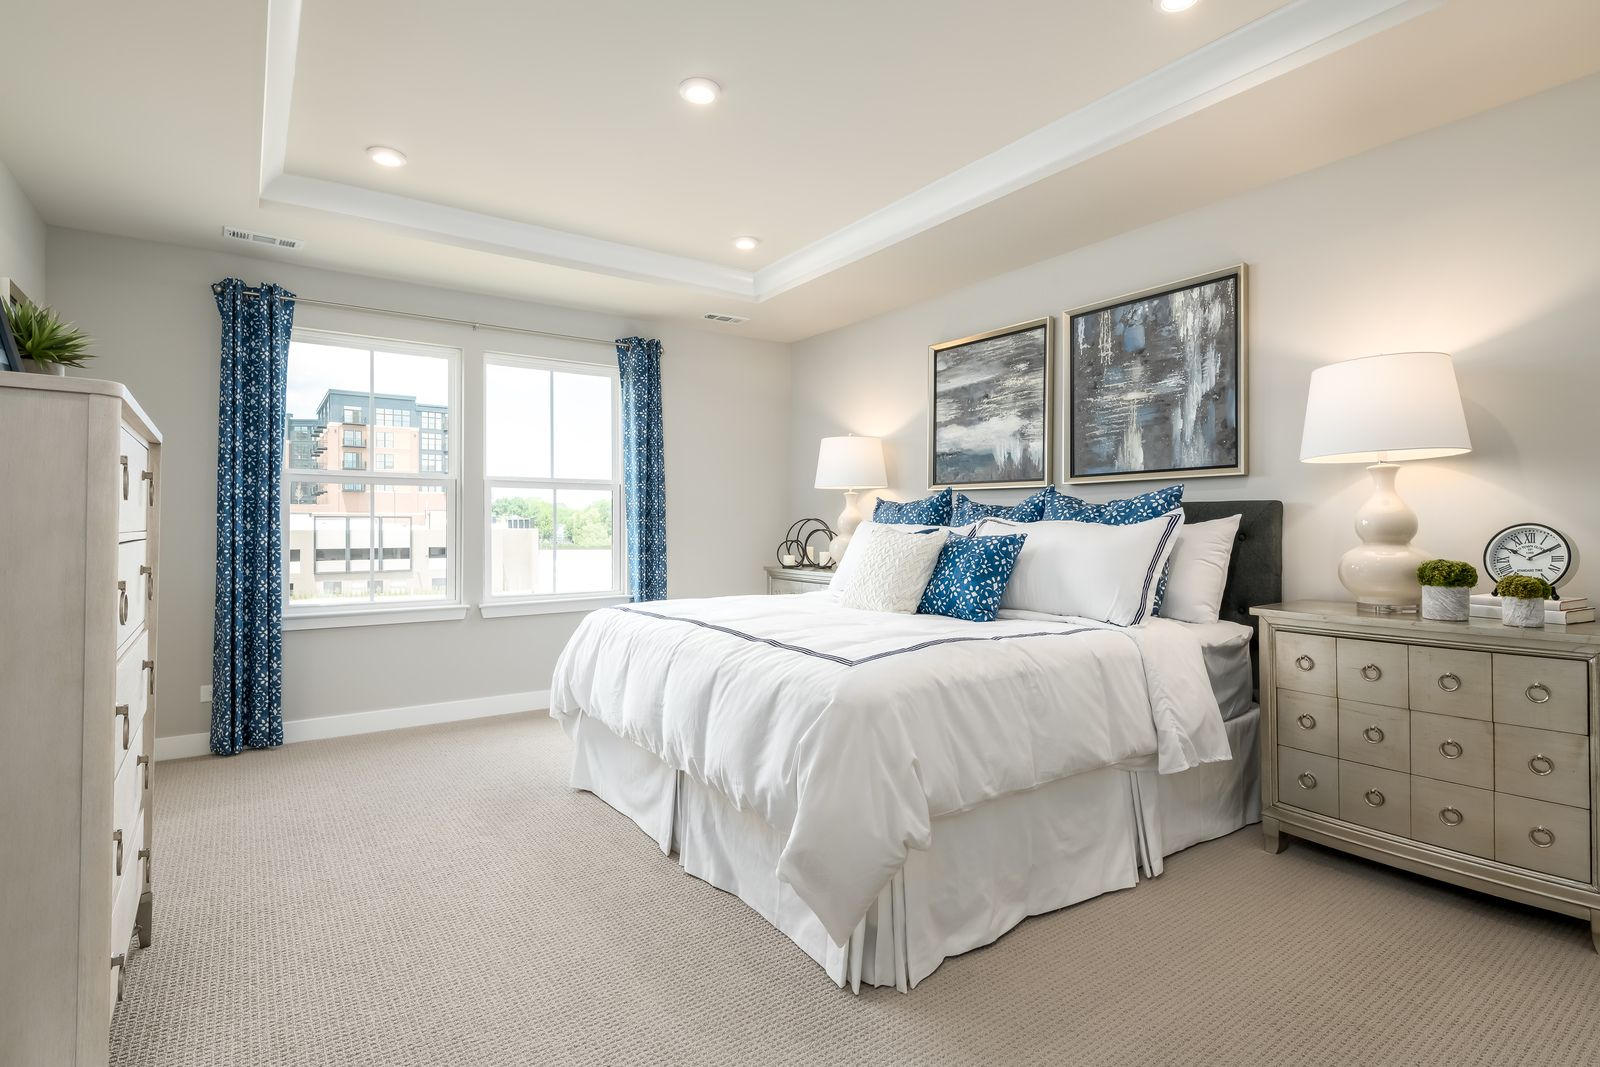 Bedroom featured in the Mendelssohn Rear Garage By Ryan Homes in Washington, MD